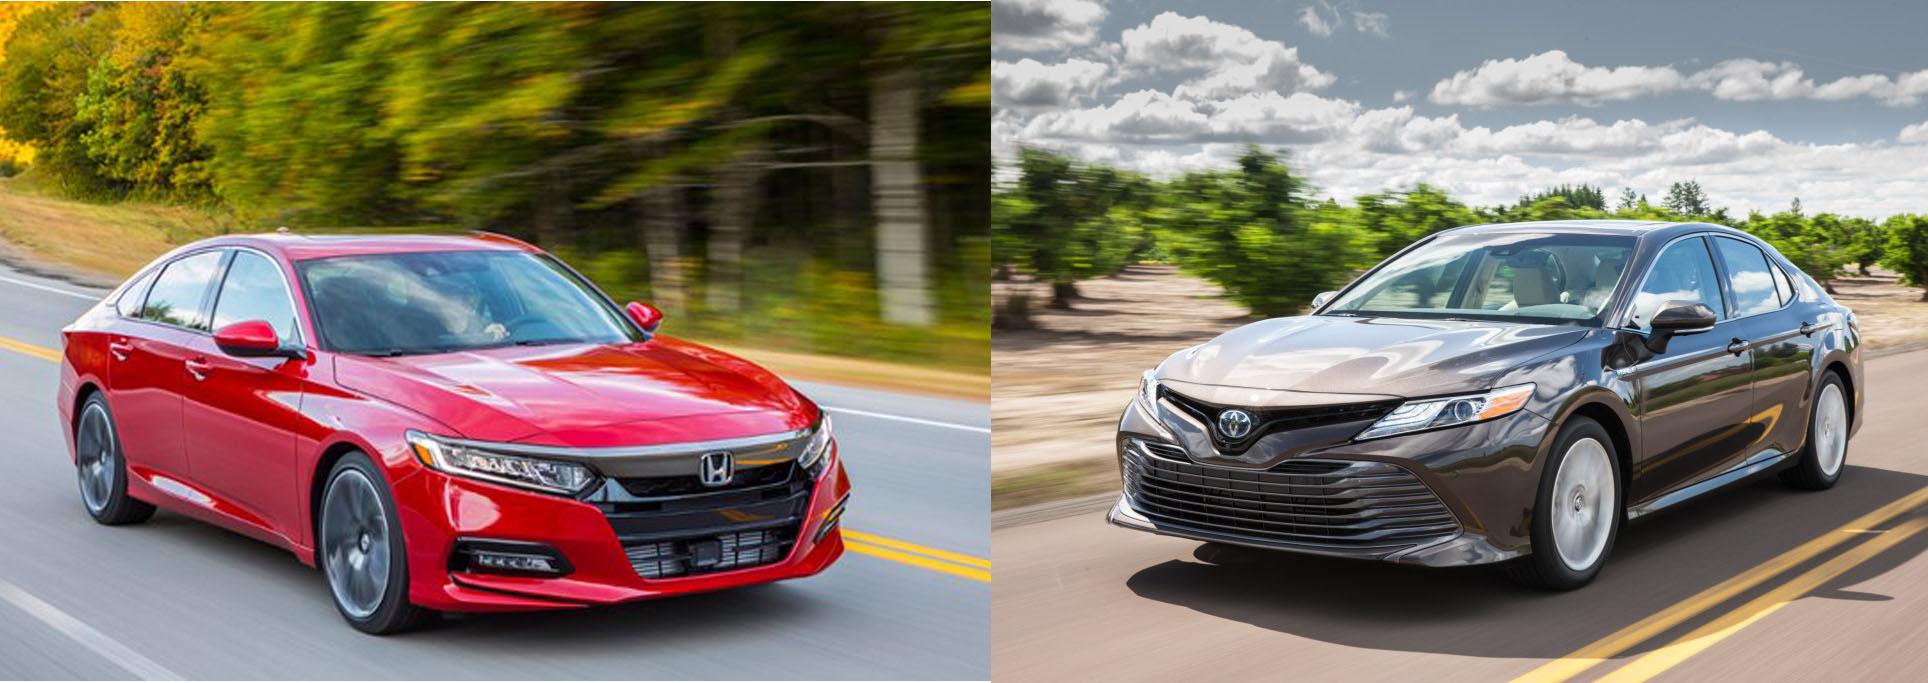 all new camry vs accord harga kijang innova 2.4 q a/t diesel venturer 2019 toyota honda quick comparison motor